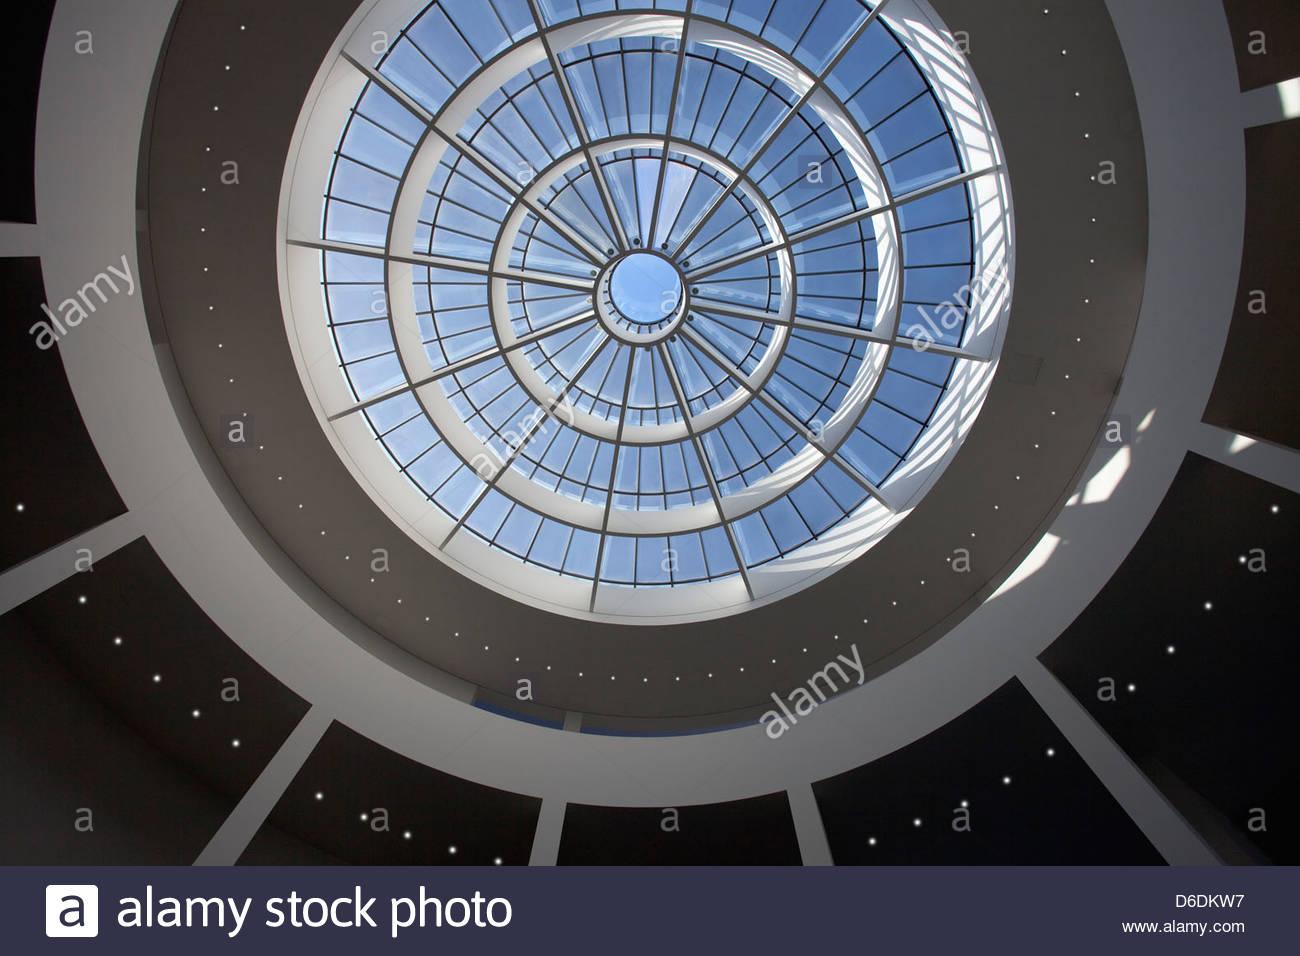 Pinakothek der Moderne Innenraum Museum München Stockbild